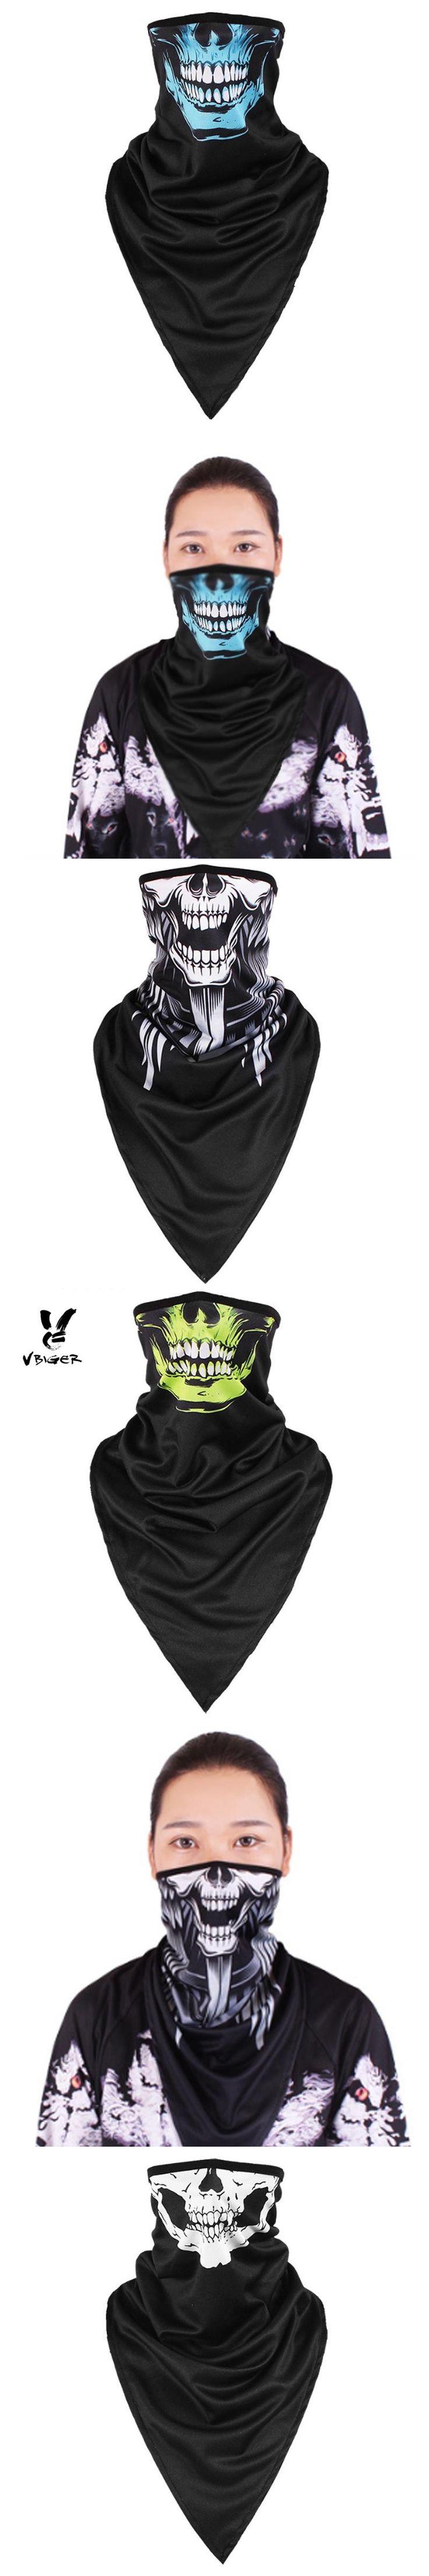 VBIGER Women Men Skull Half Face Biker Bandana Mask Bandanas Scarf Windproof SunProof CS Face Mask for Cycling Hiking